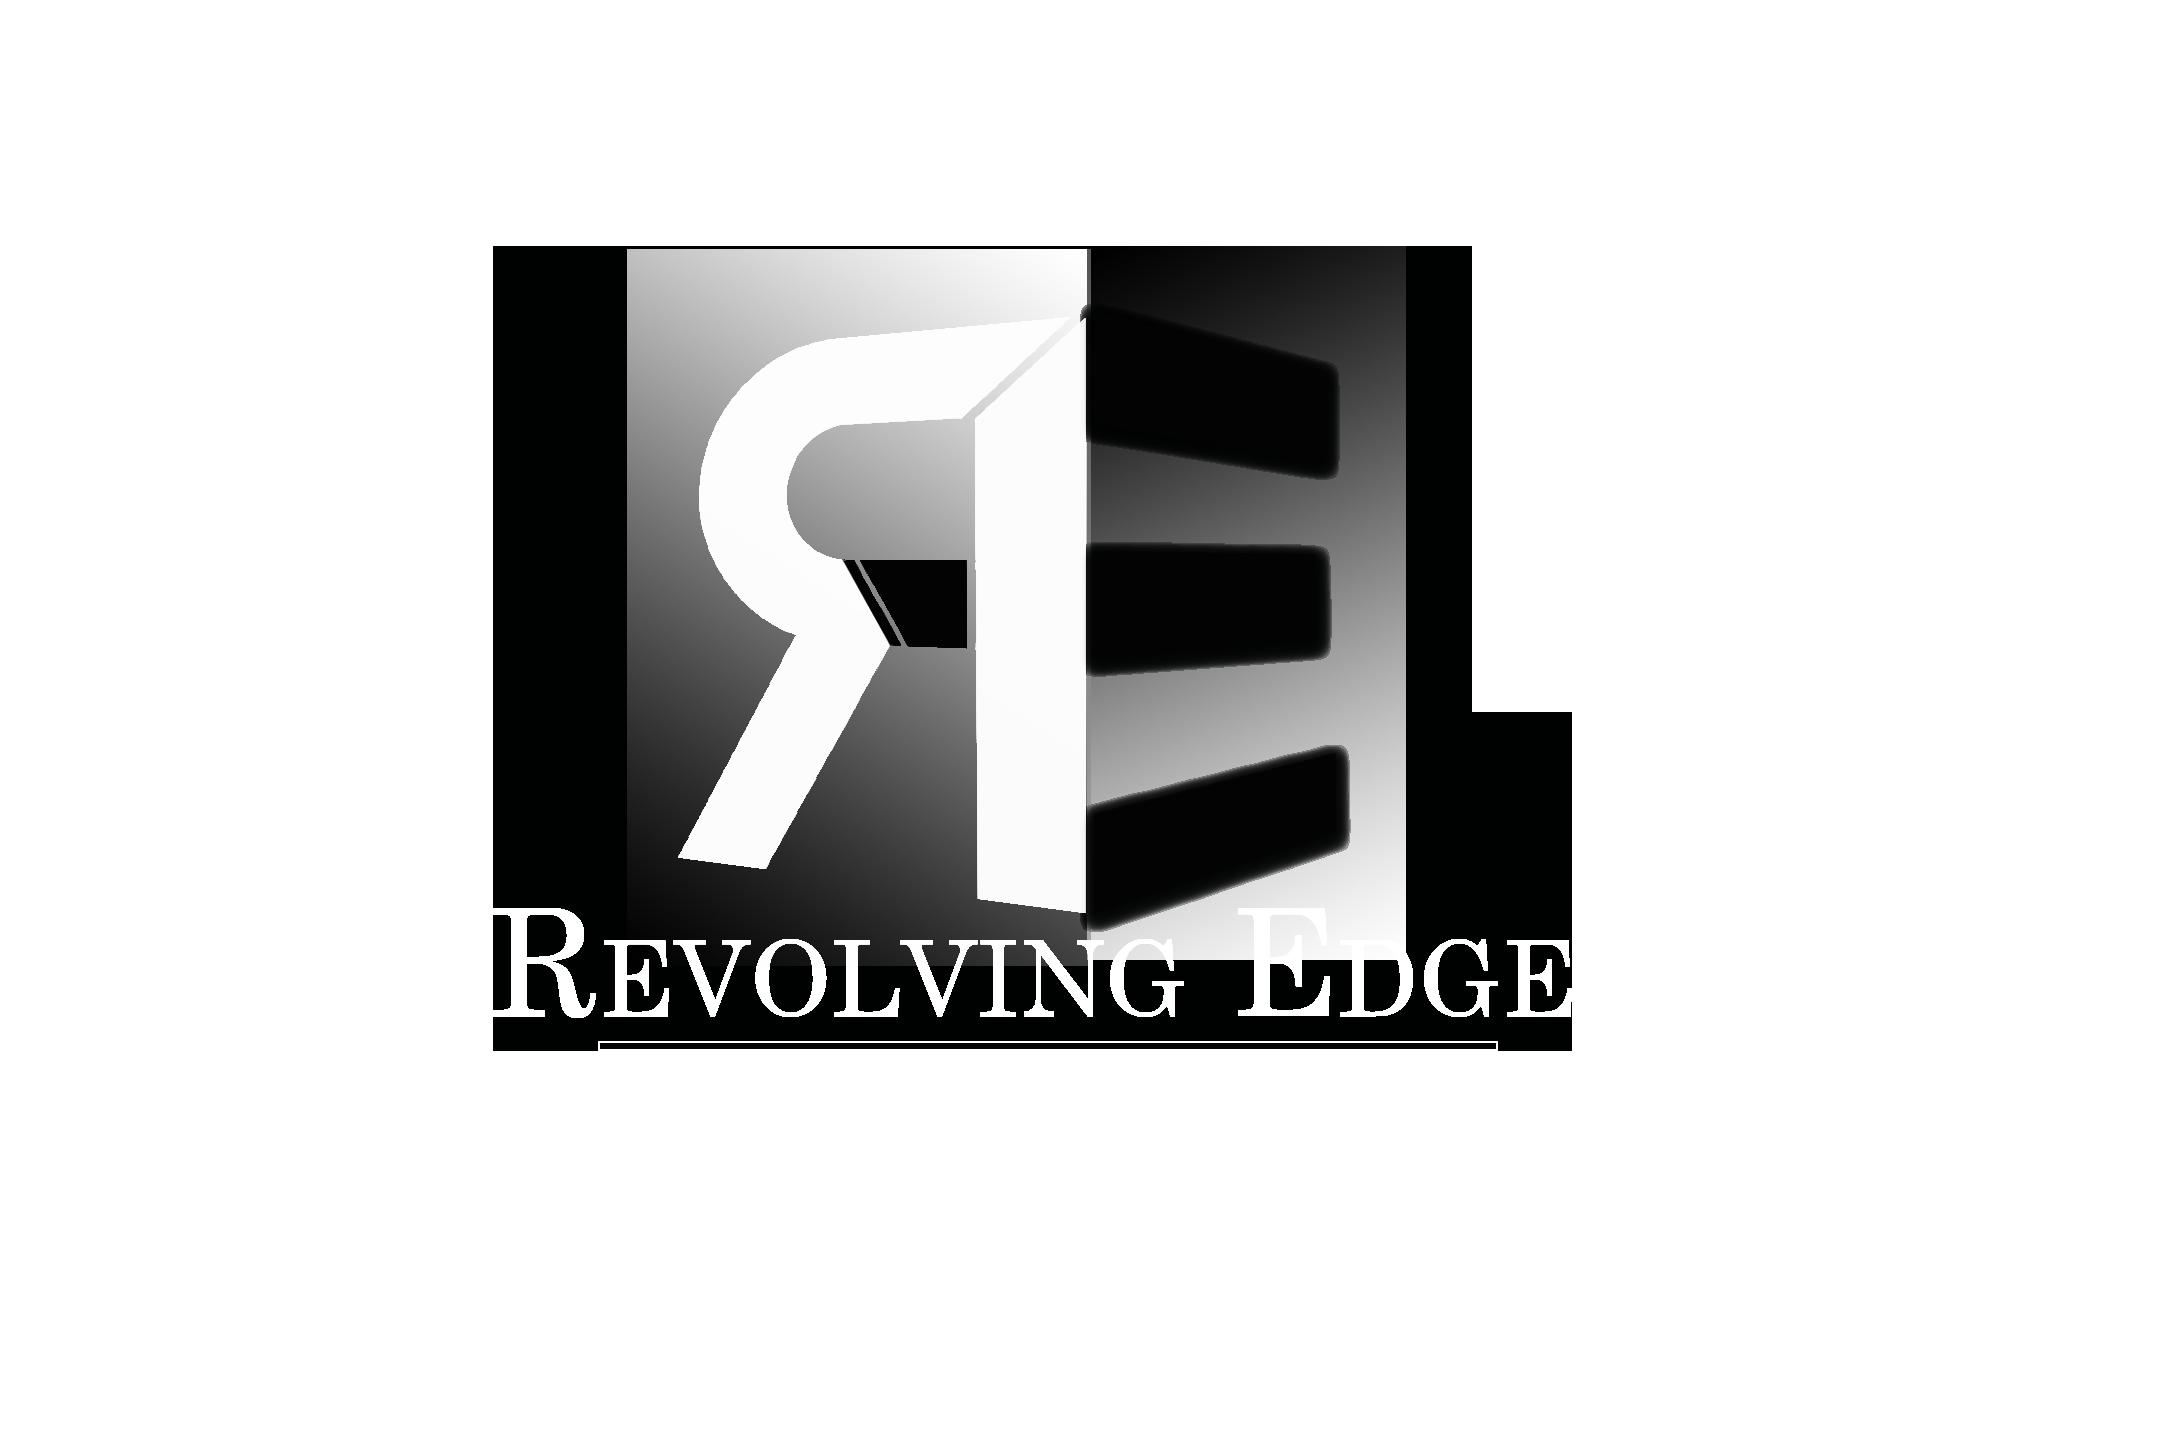 revolving edge logo bw 2.png